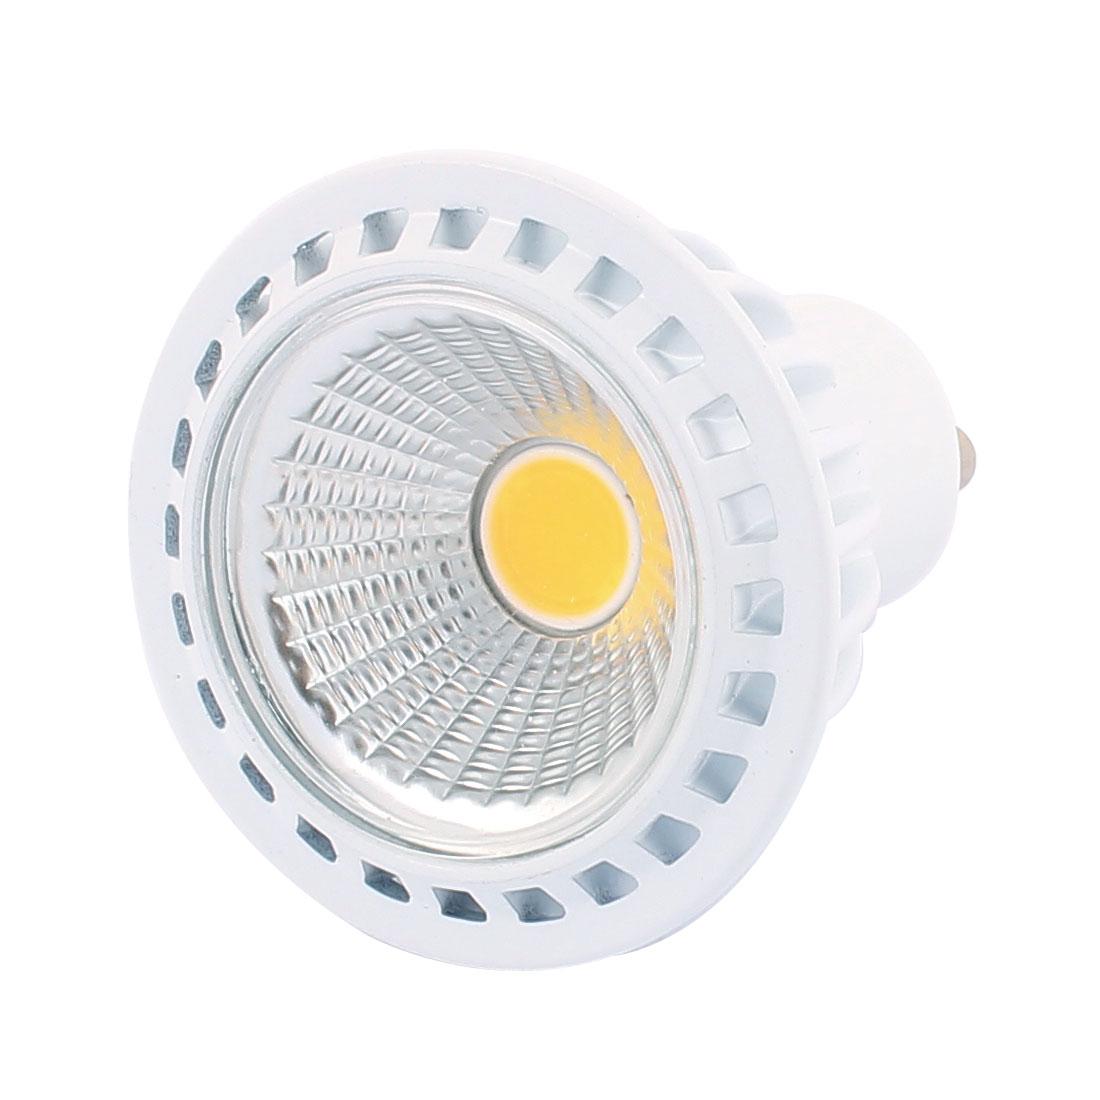 AC85-265V 3W Ultra Bright GU10 COB LED Spotlight Lamp Bulb Downlight Pure White